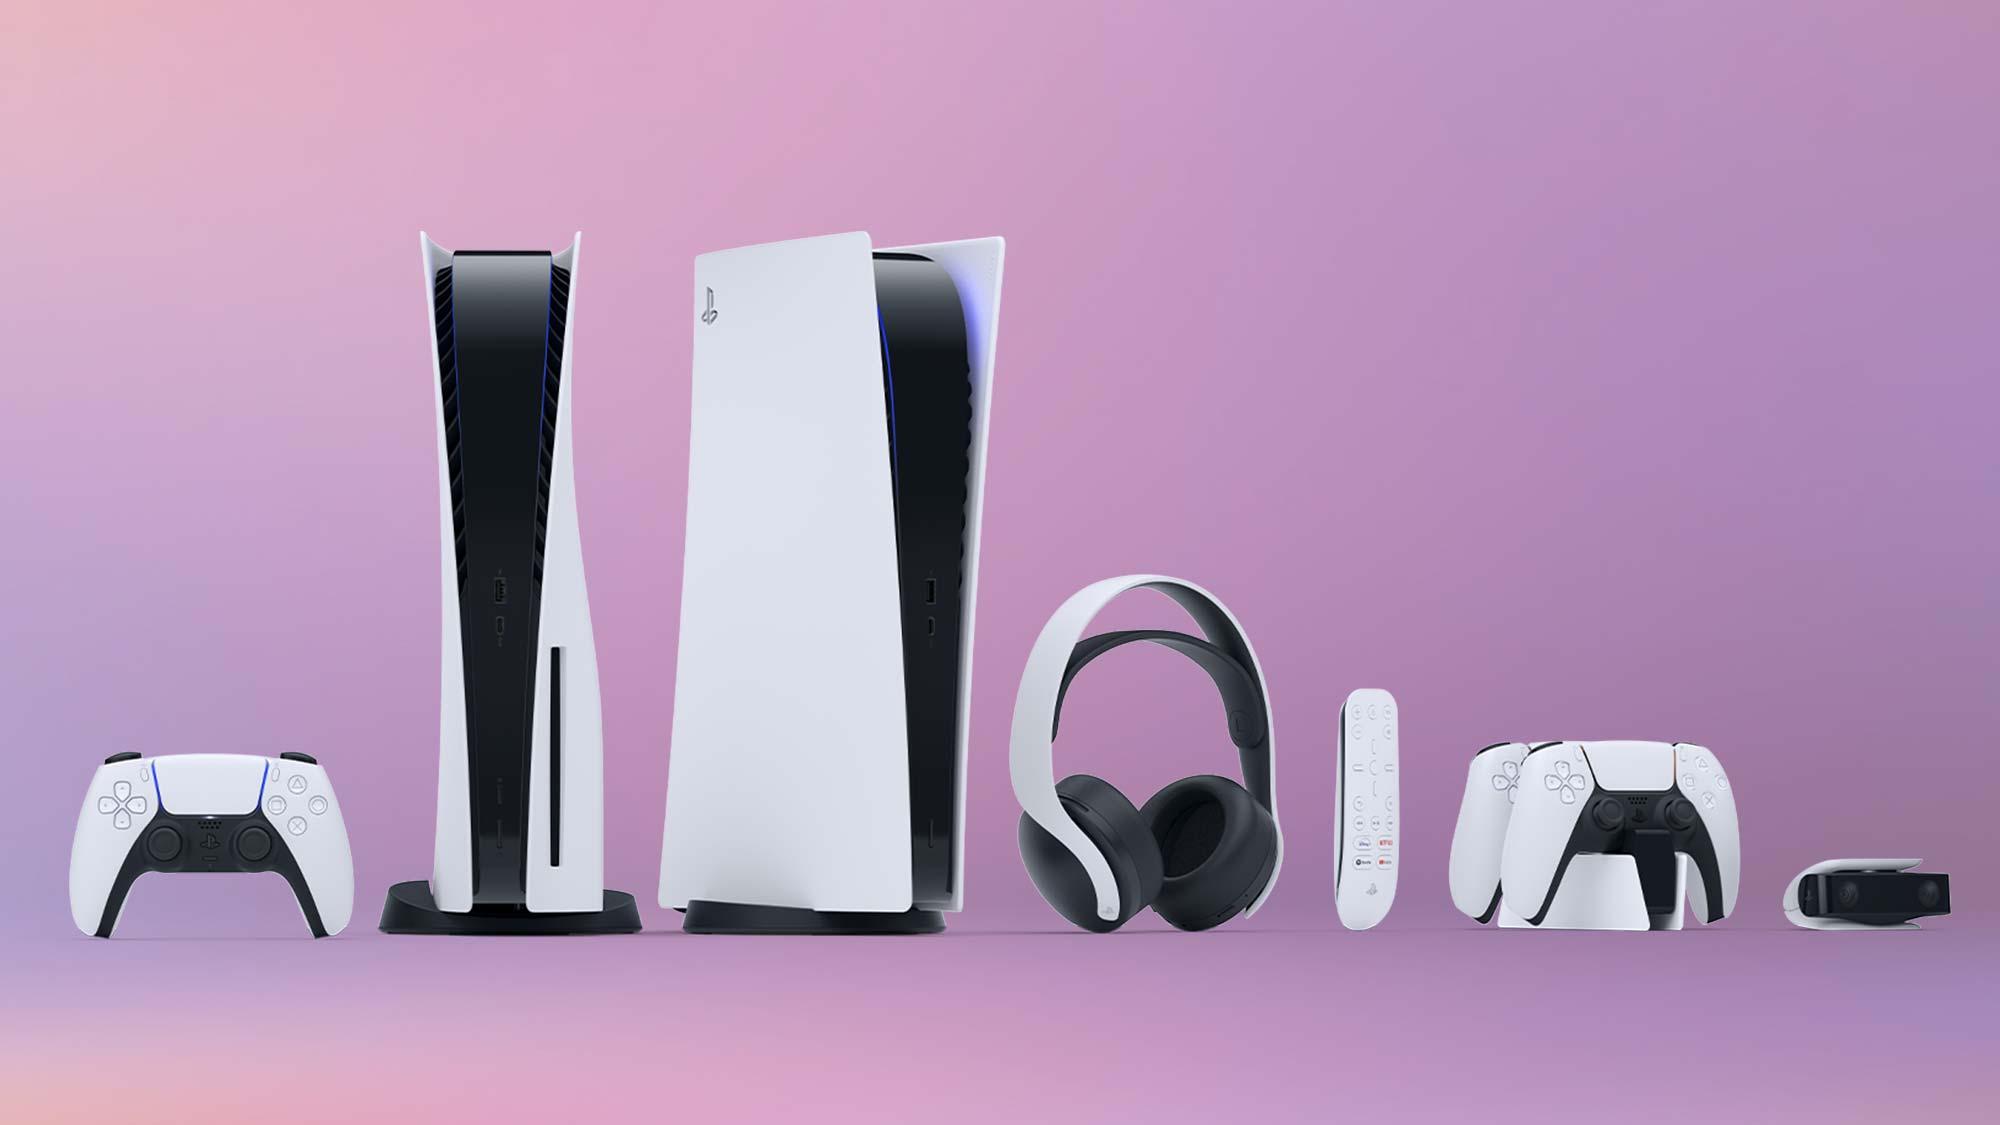 Best PS5 accessories